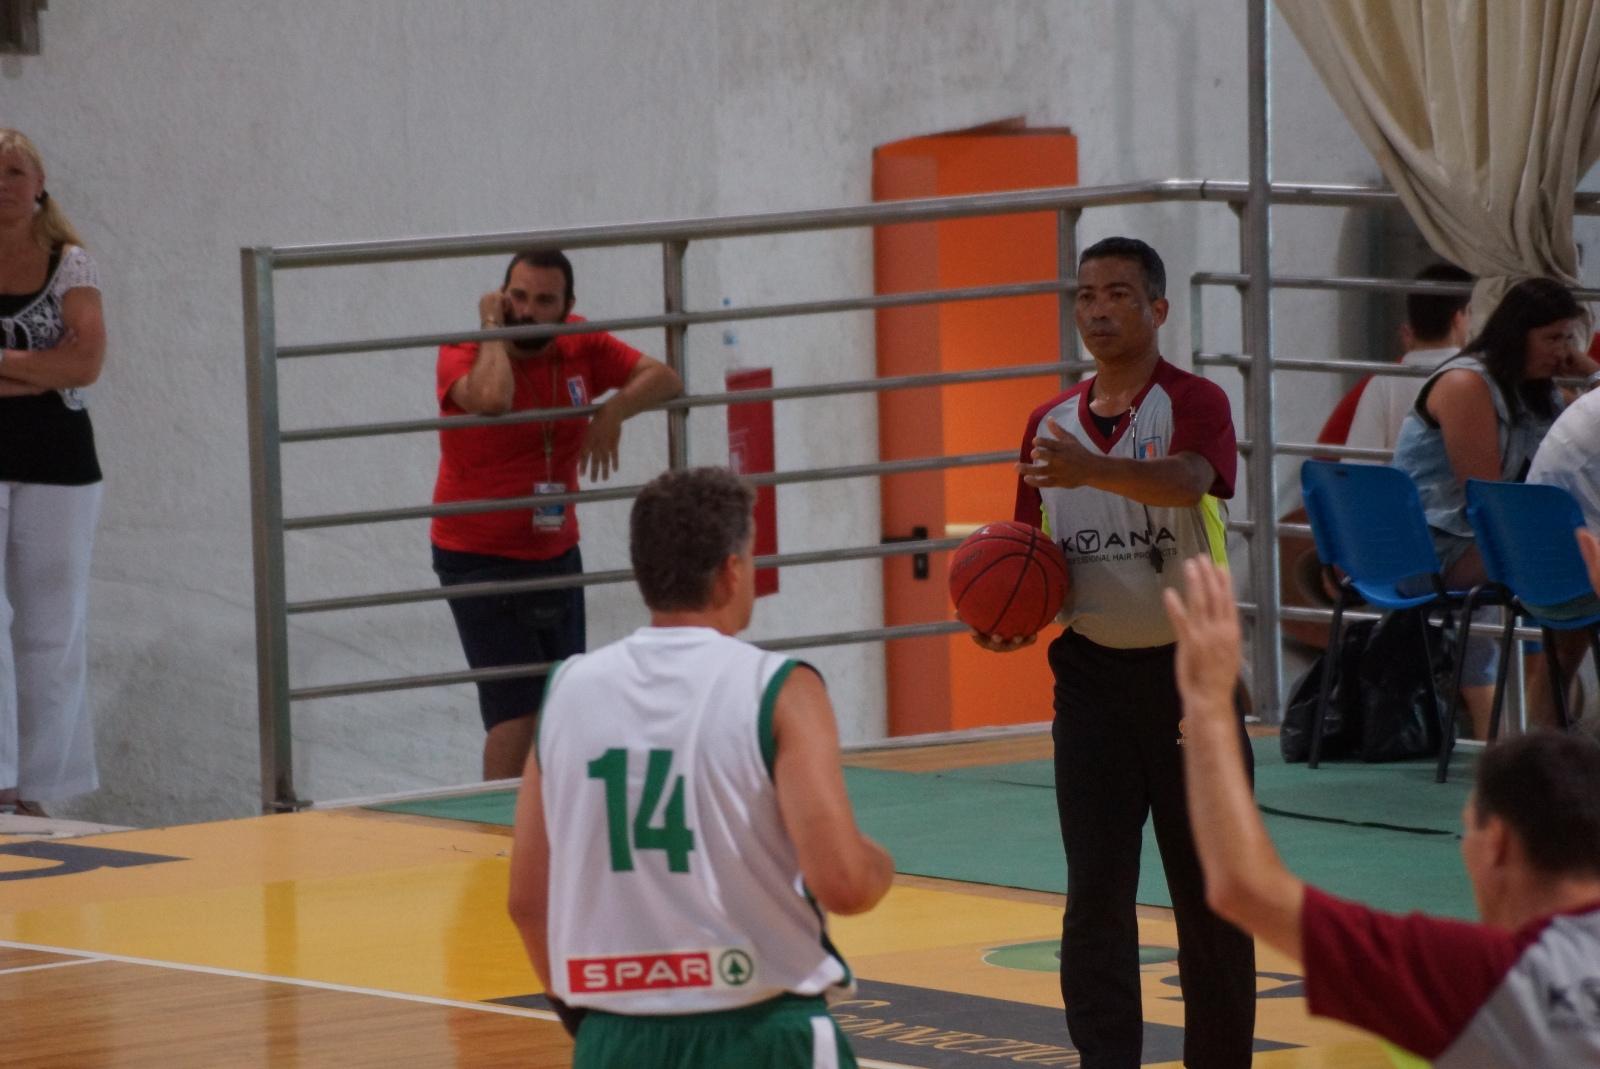 ALEXANDRION 1 |M50+ |LUXURIS SLOVENIA B - CHILE